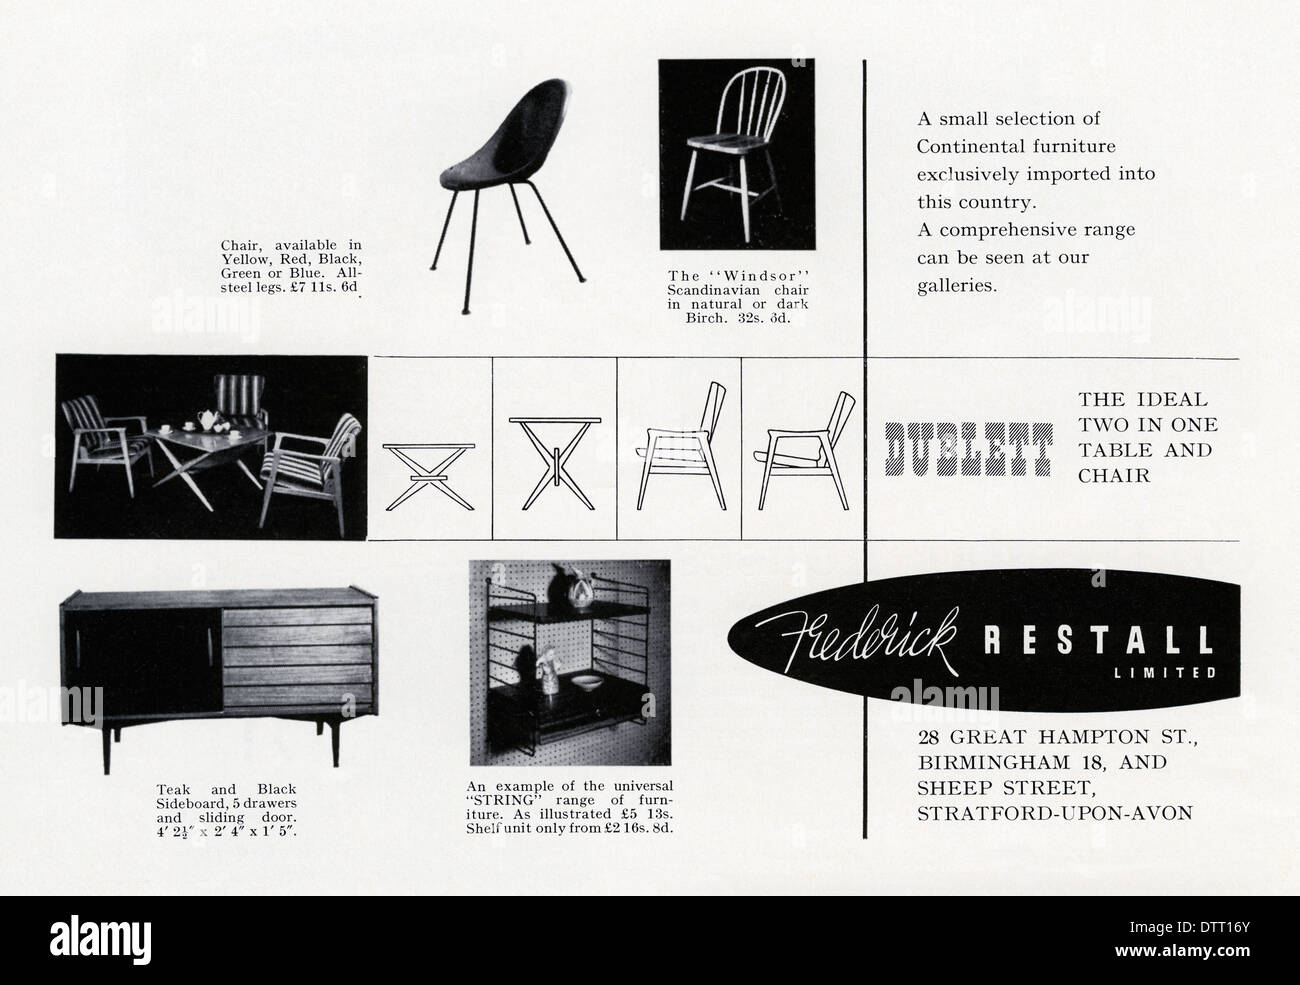 alte tische fabulous gallery of biete alte sthle mit punziertem leder with alte tische with. Black Bedroom Furniture Sets. Home Design Ideas